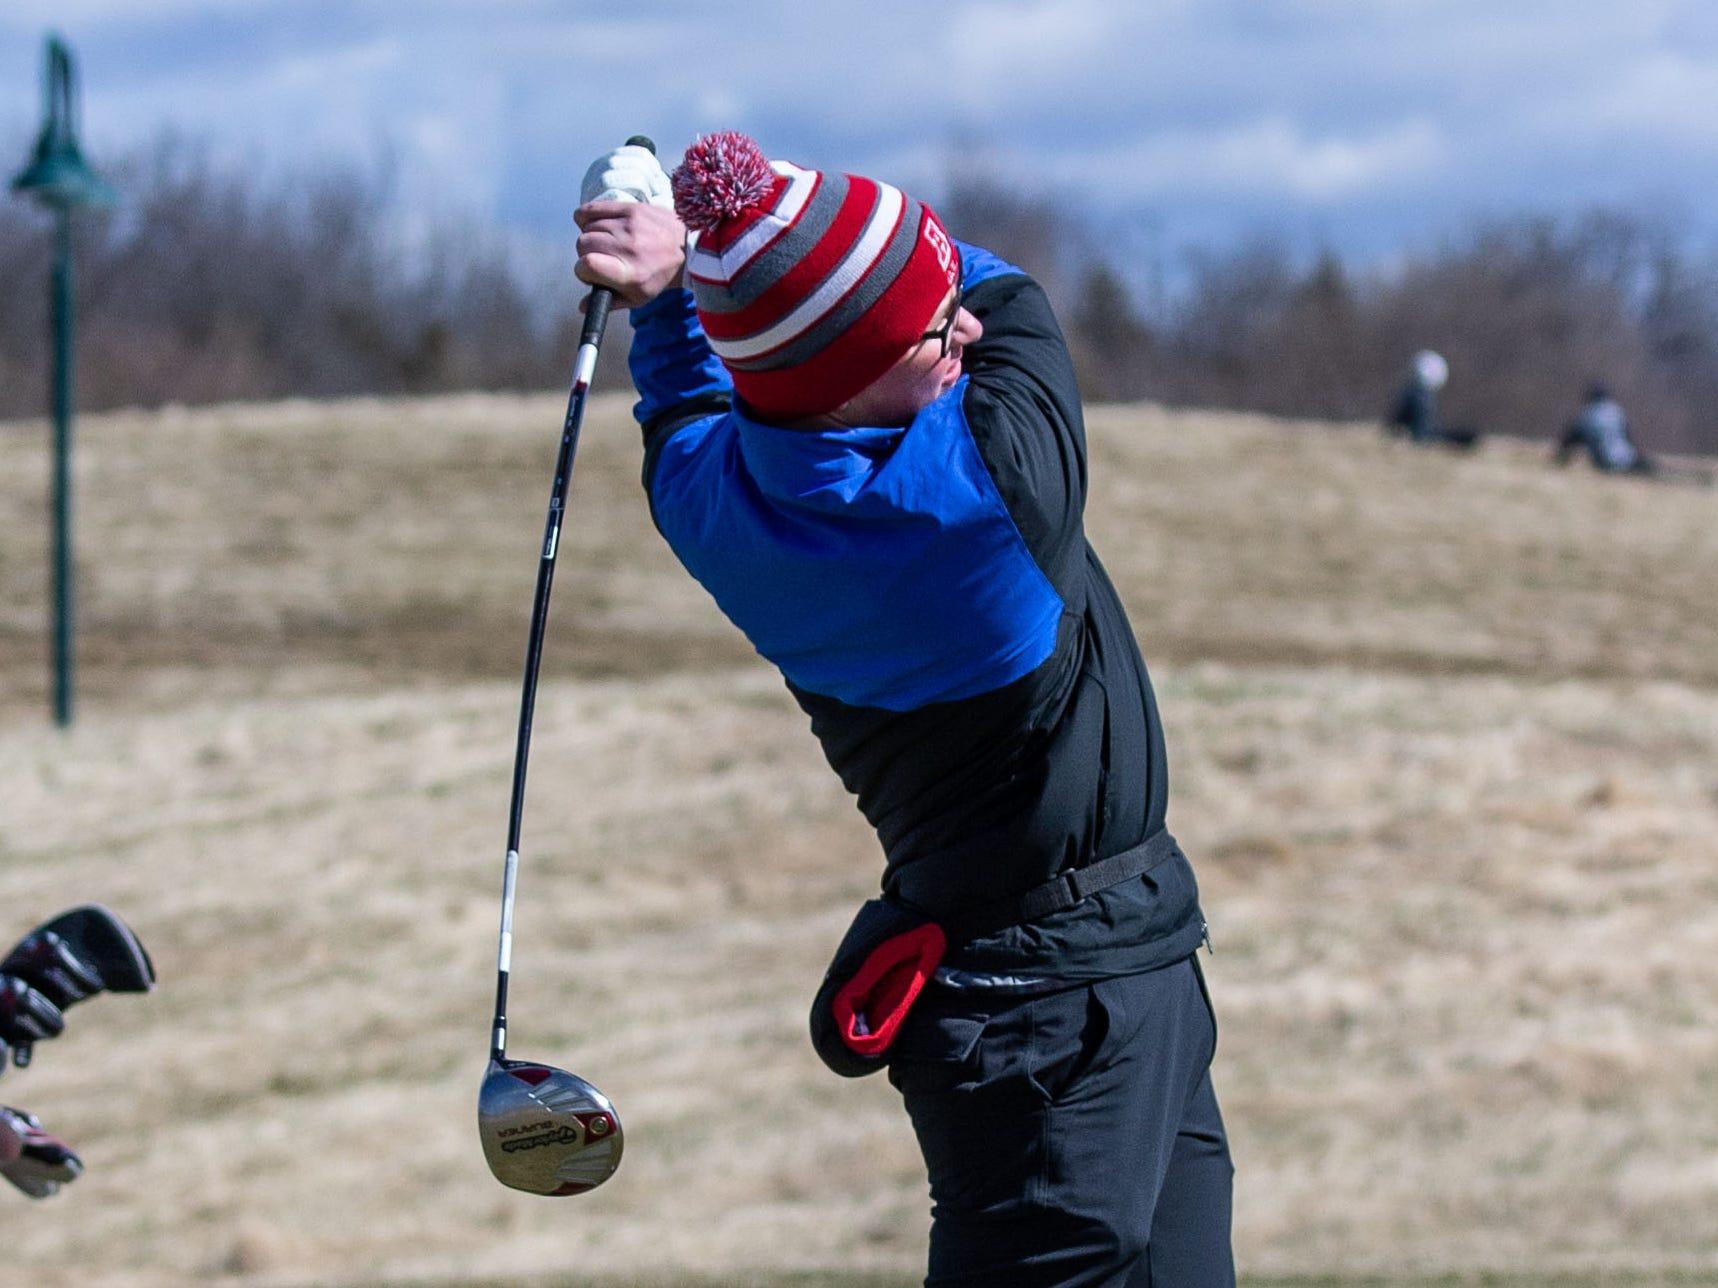 Arrowhead golfer David Kneiser competes in the Catholic Memorial 2019 Crusader Invitational at Broadlands Golf Club in North Prairie on Saturday, April 13, 2019.